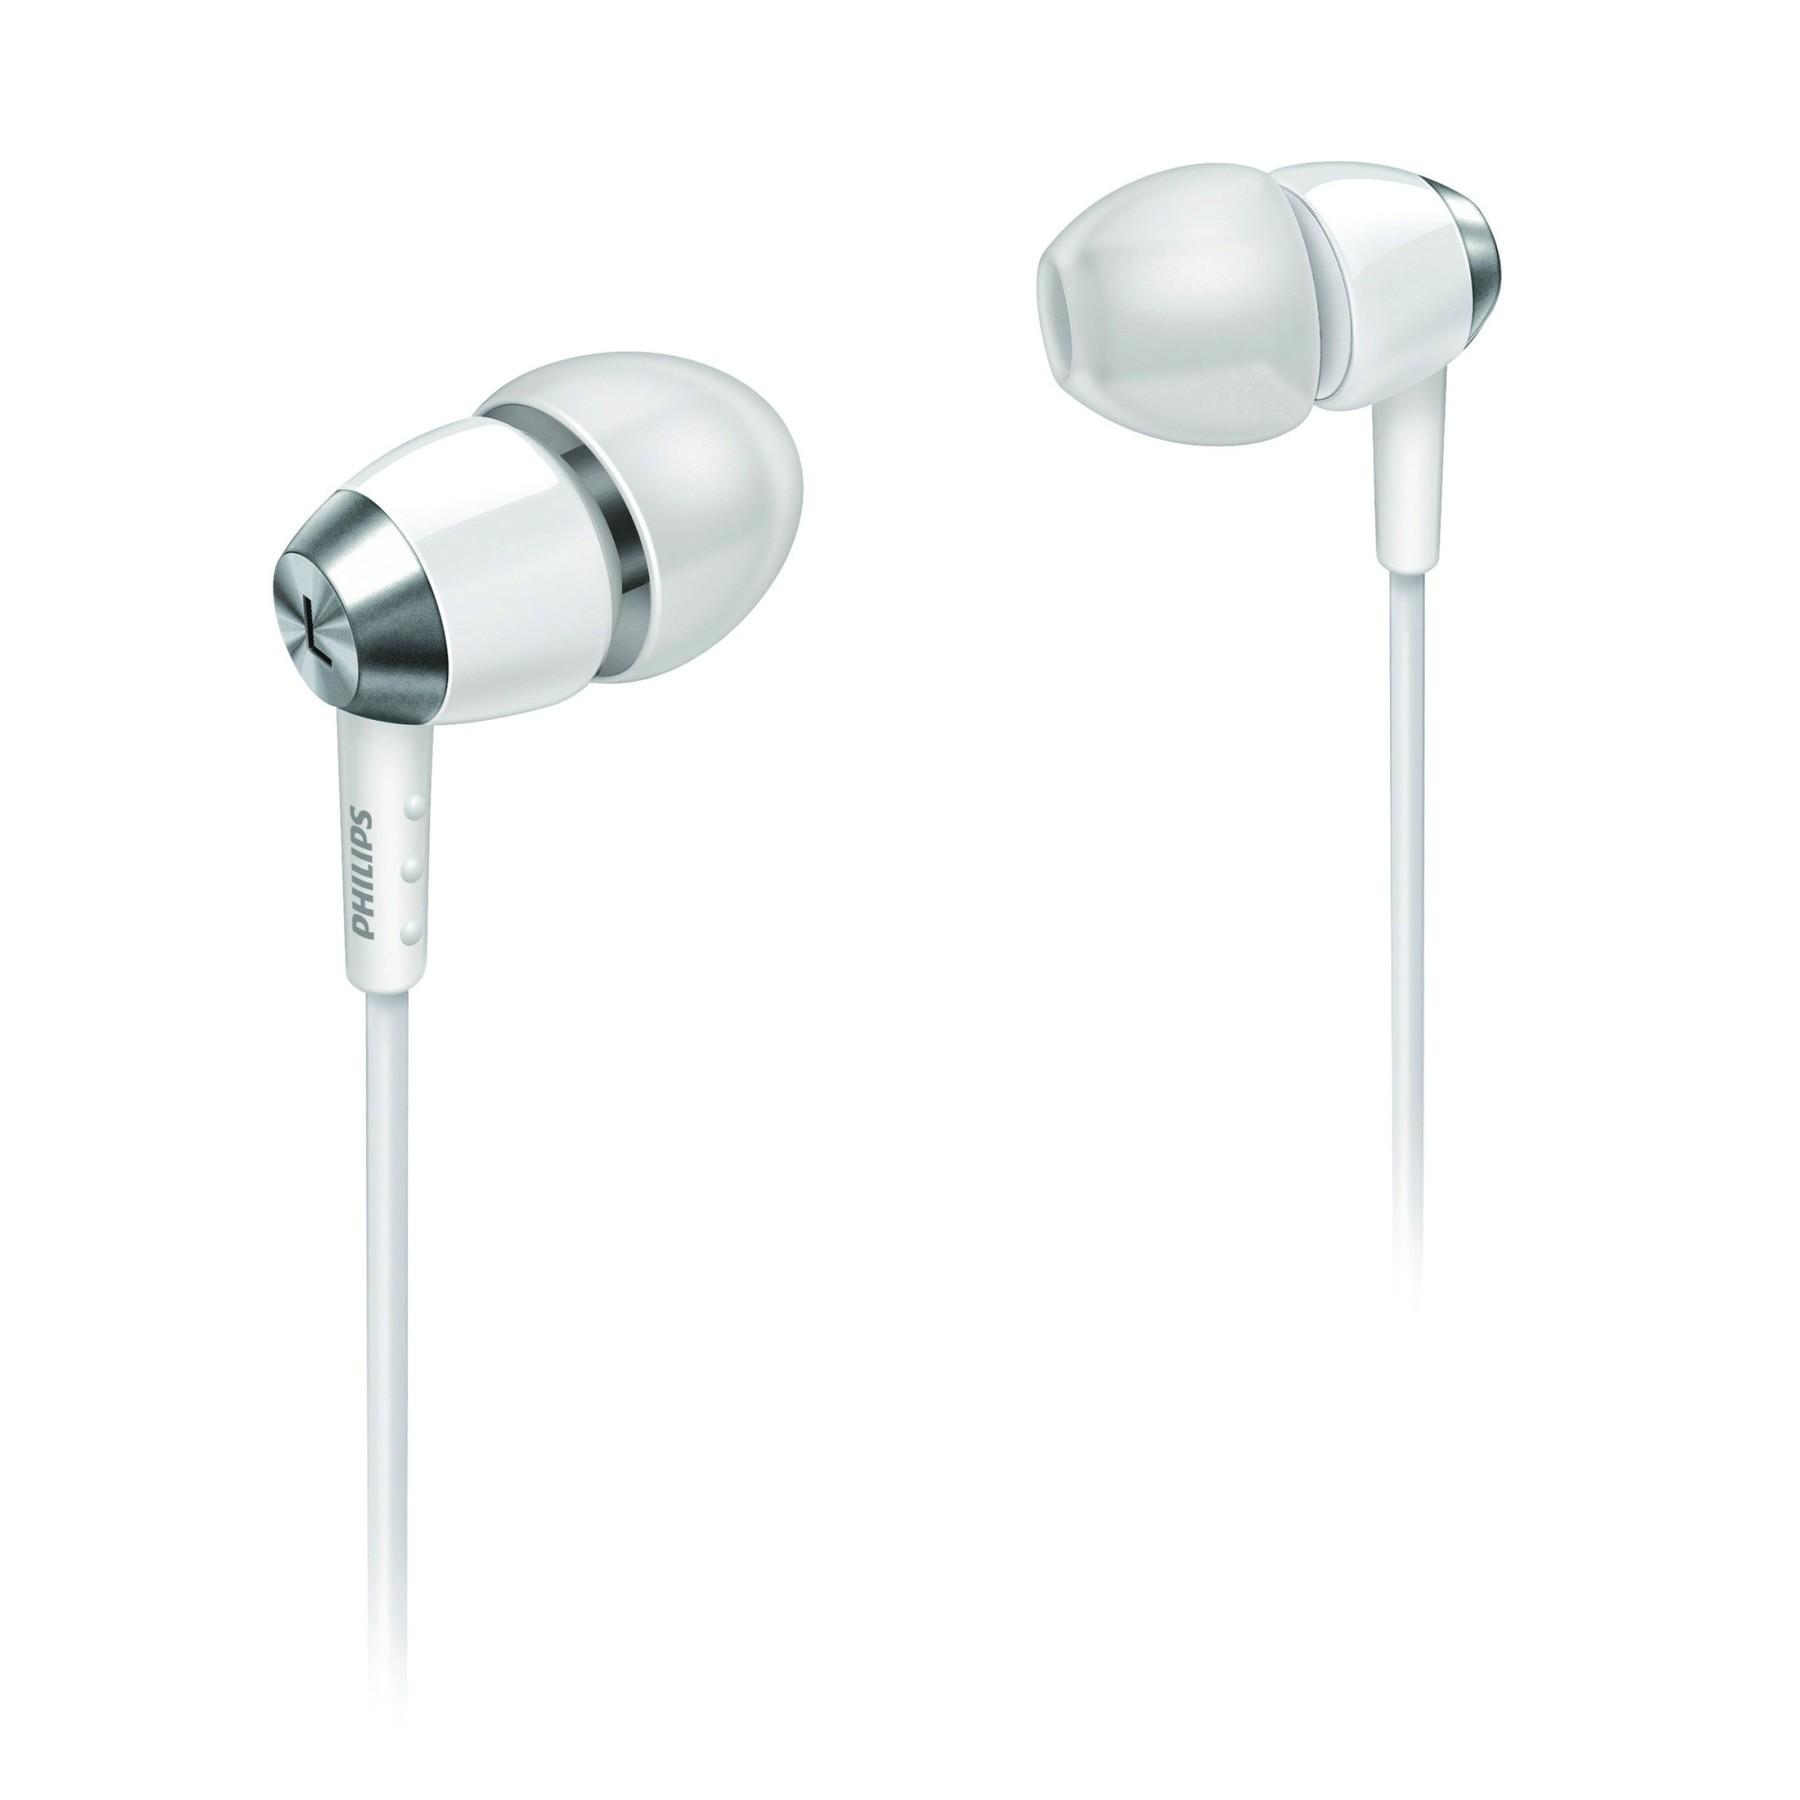 Headphone Rubber Caps Rubber Caps Anti-tangle